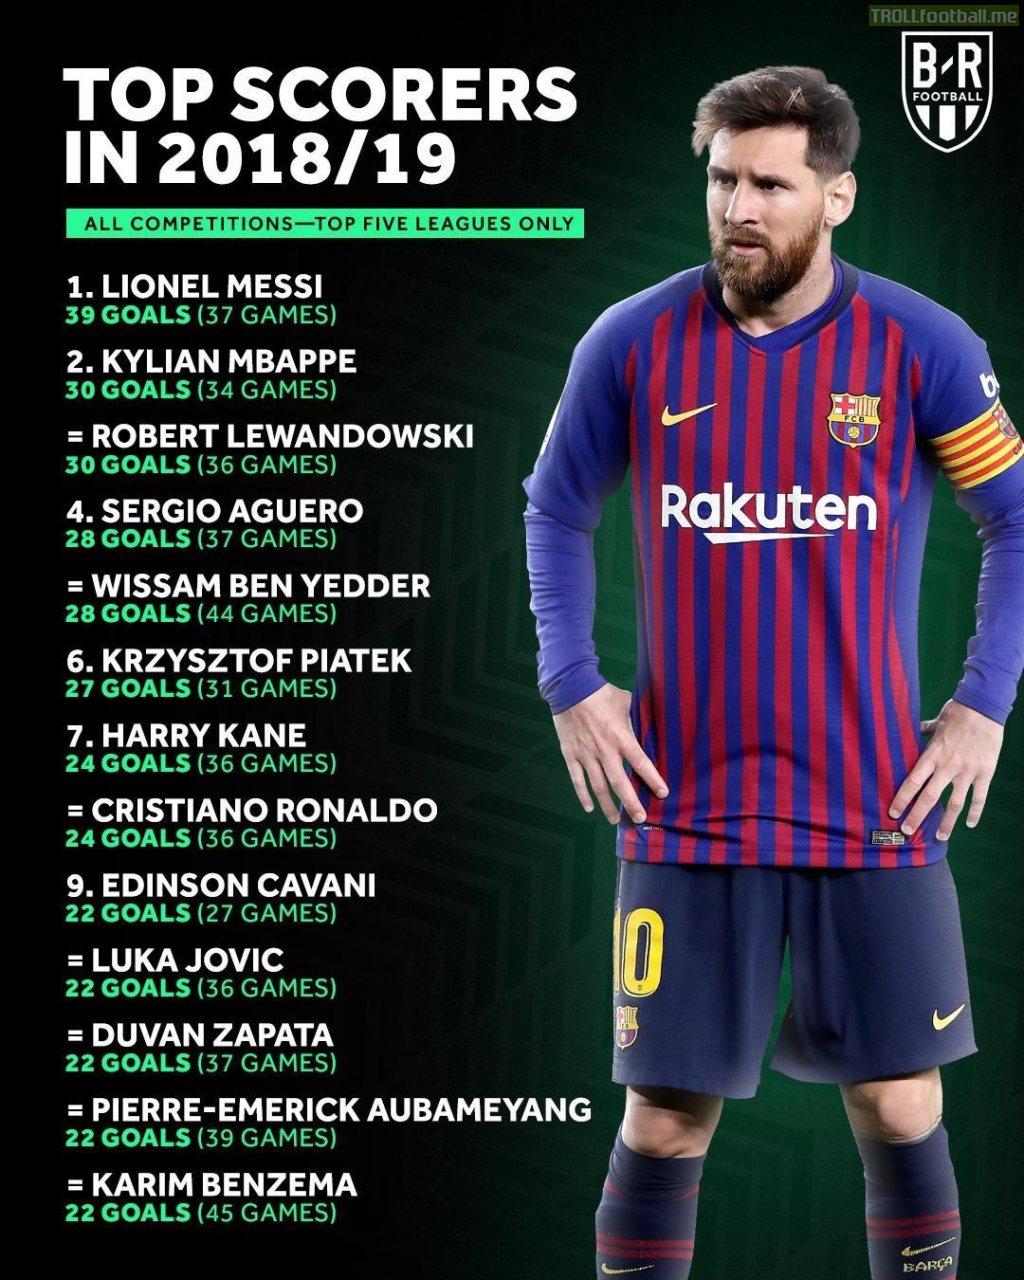 Top scorers in Europe's top five leagues this season.